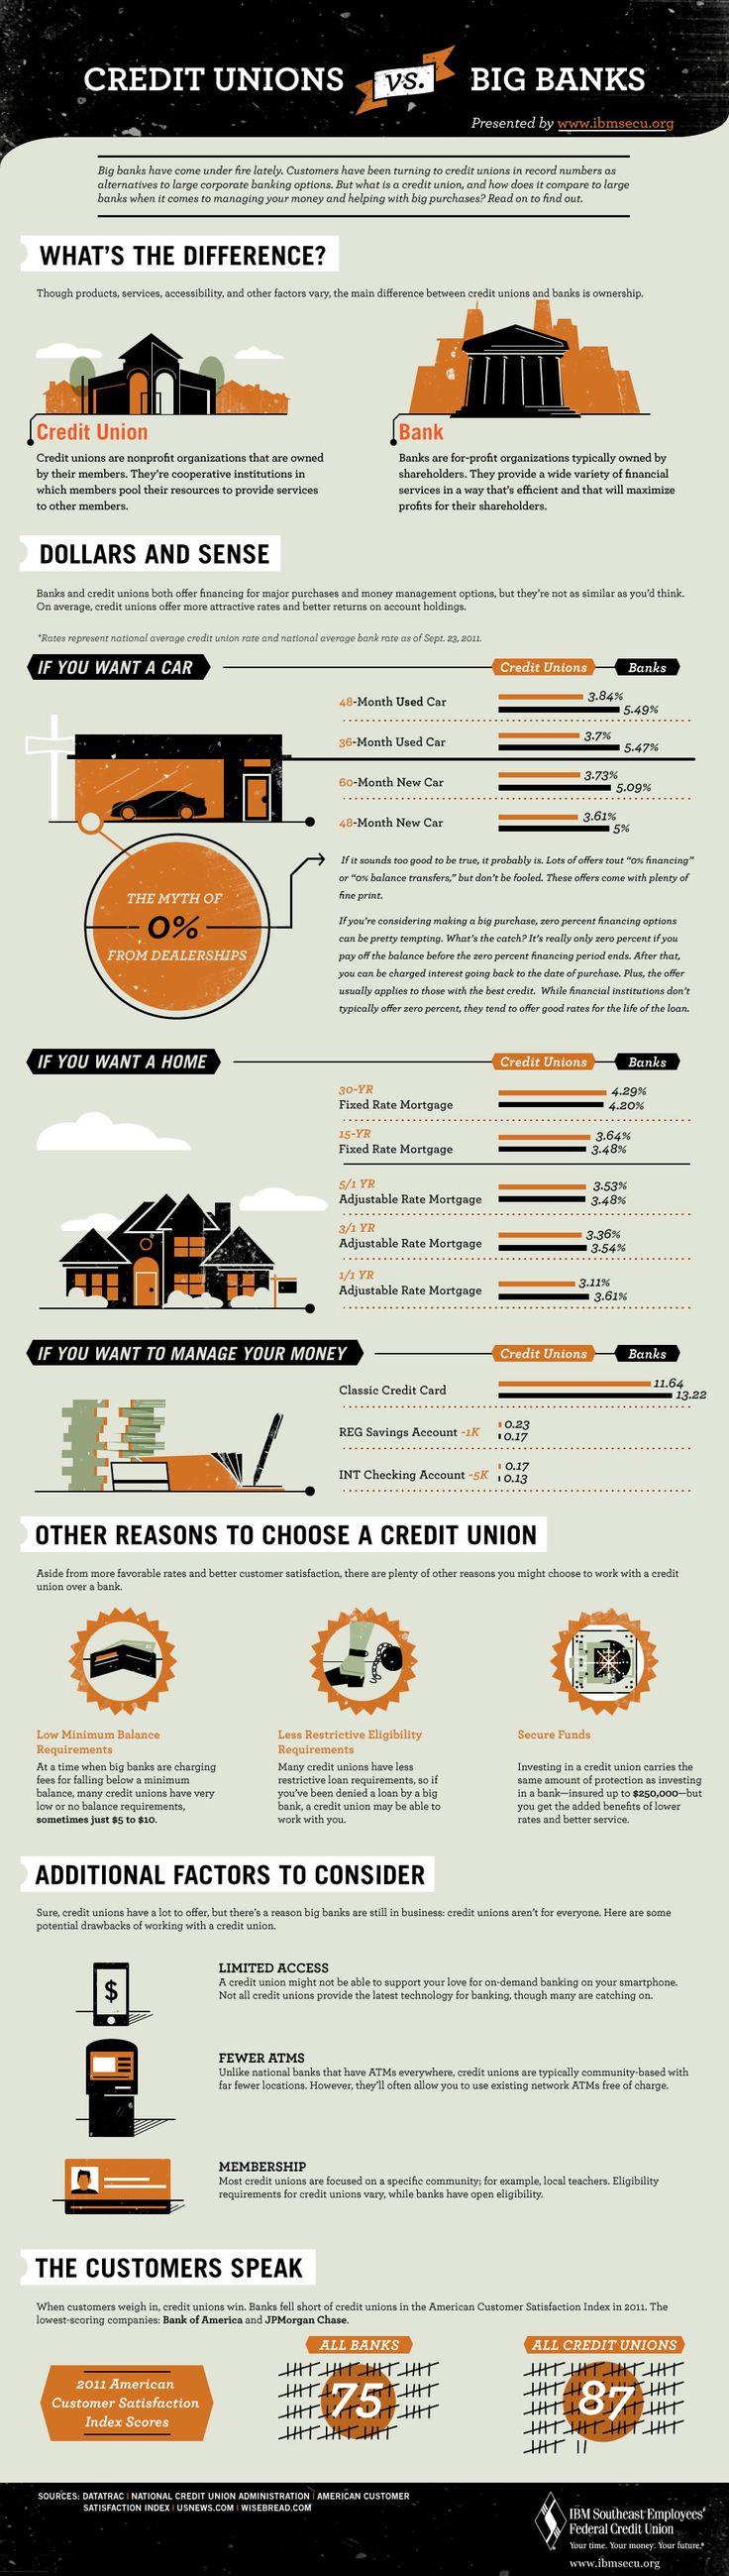 Credit unions vs big banks